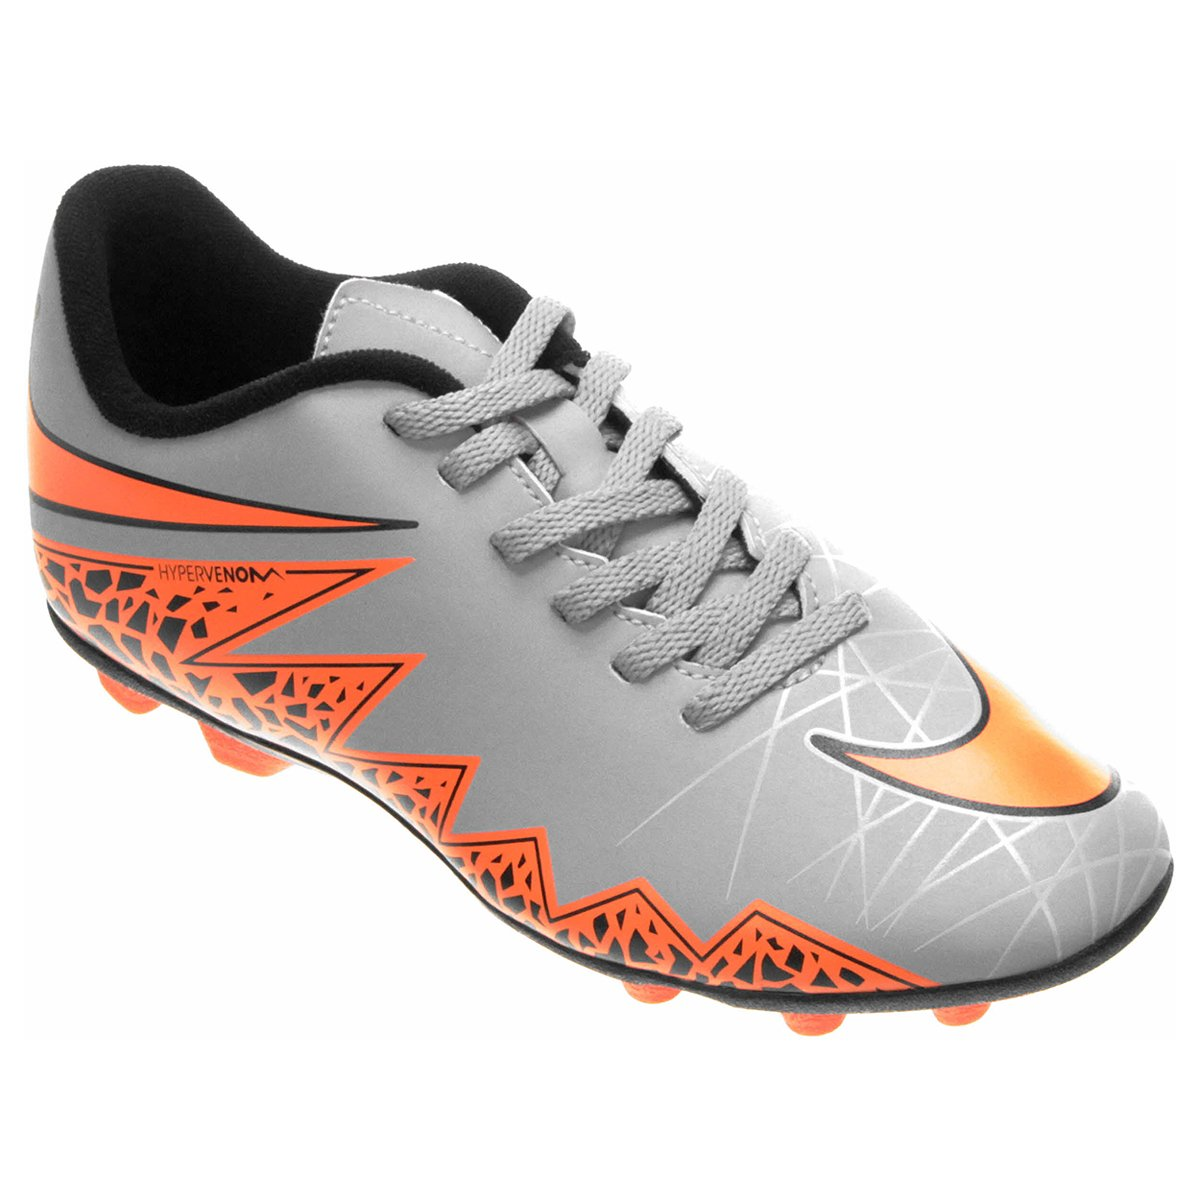 4bcc2268d6 Chuteira Nike Hypervenom Phade 2 FG-R Infantil